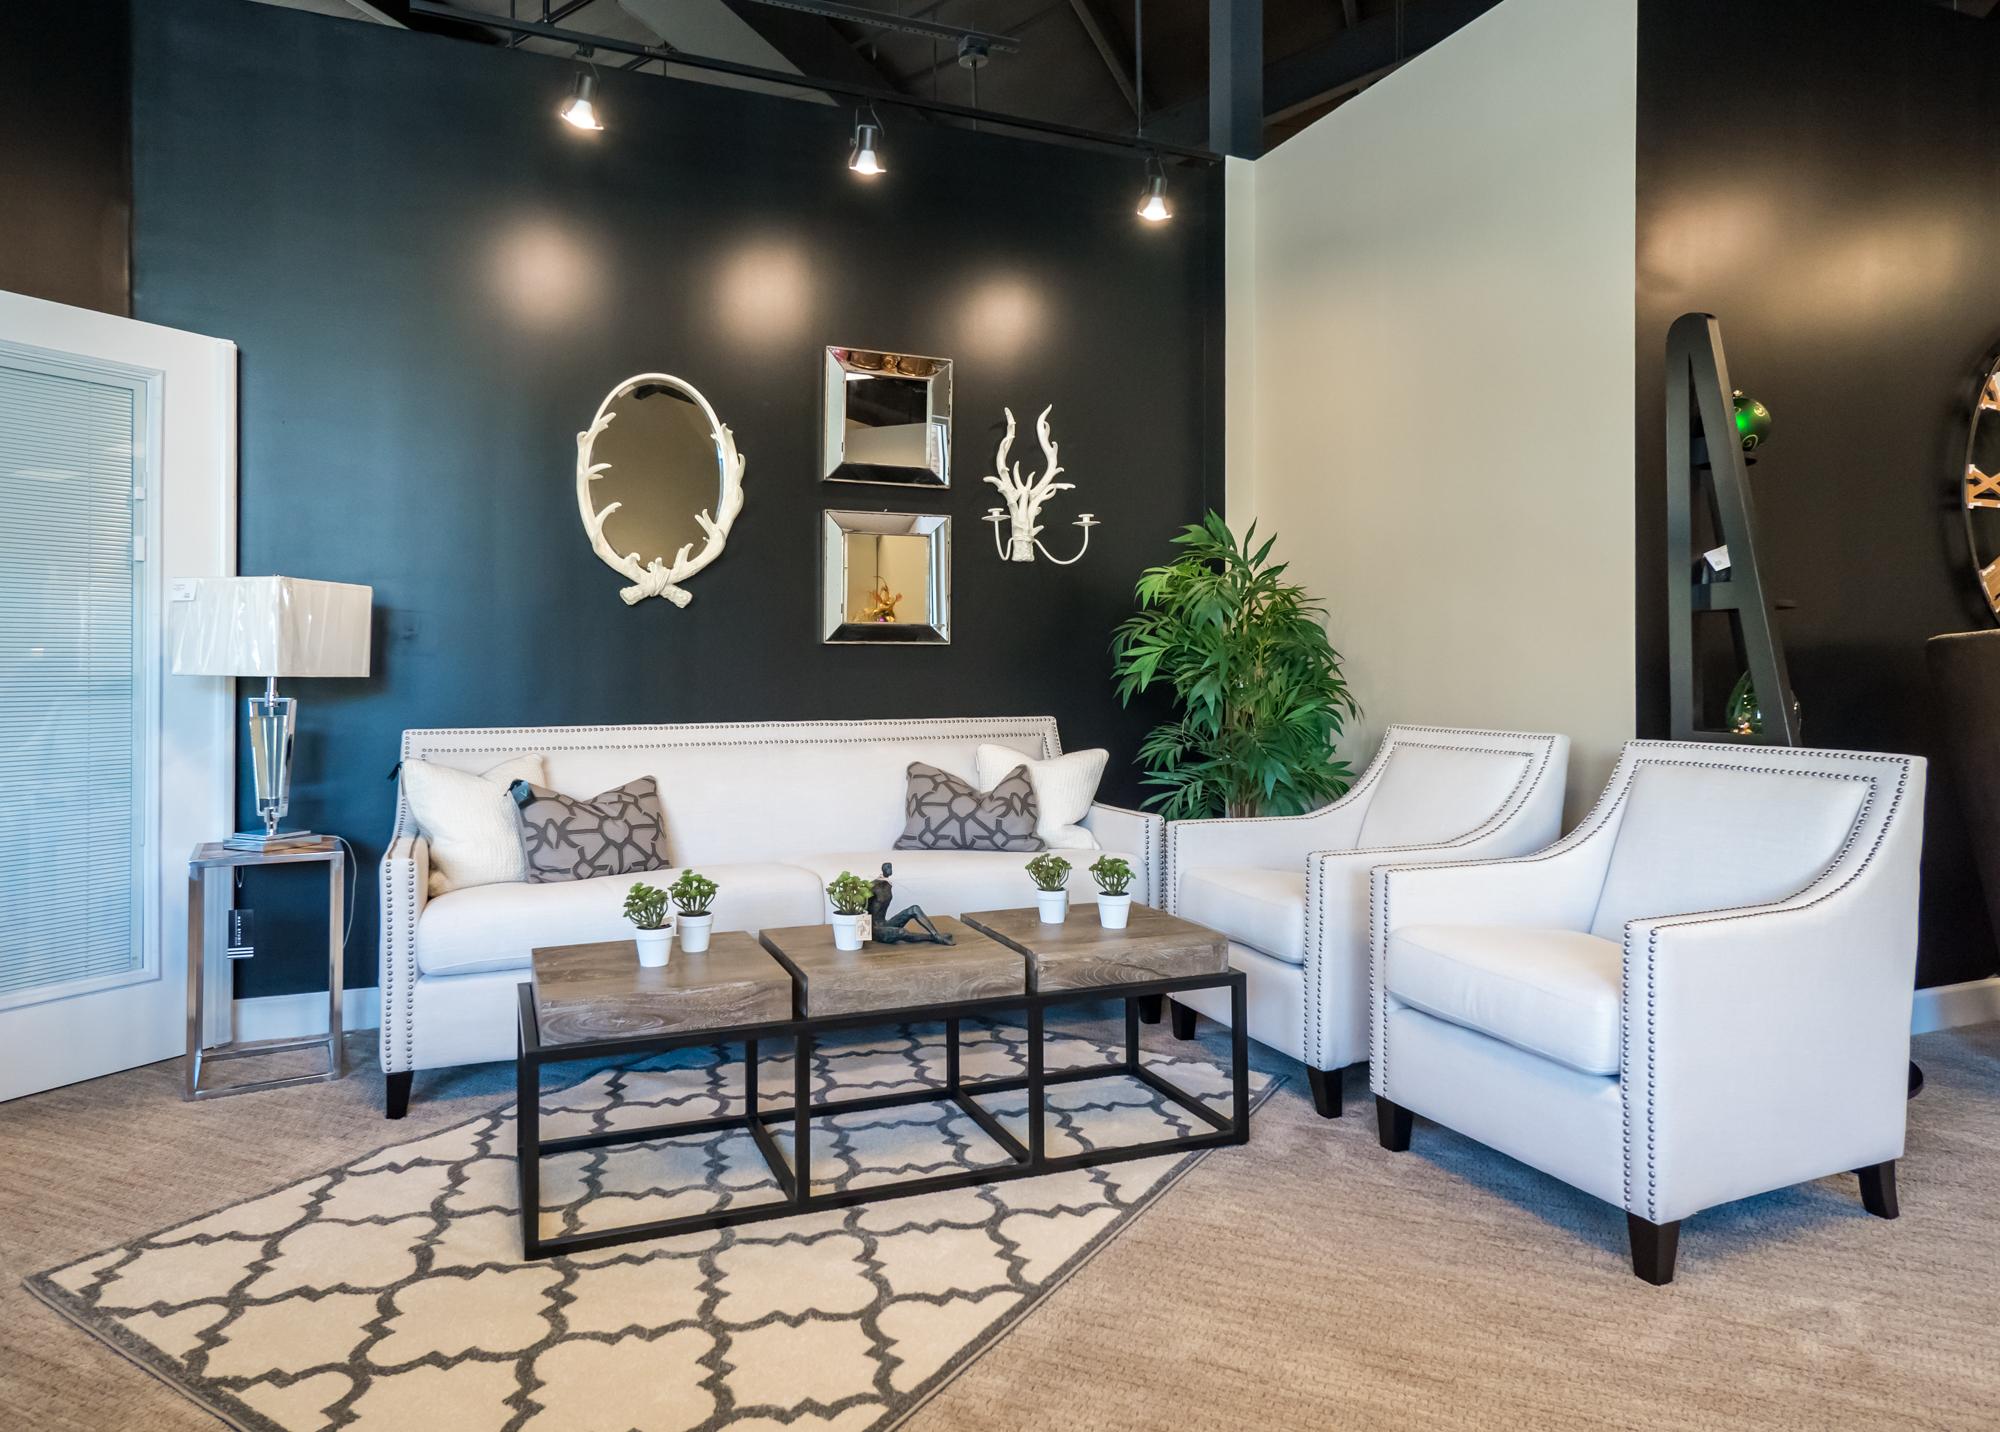 interior design services, builder resources, jax home builders